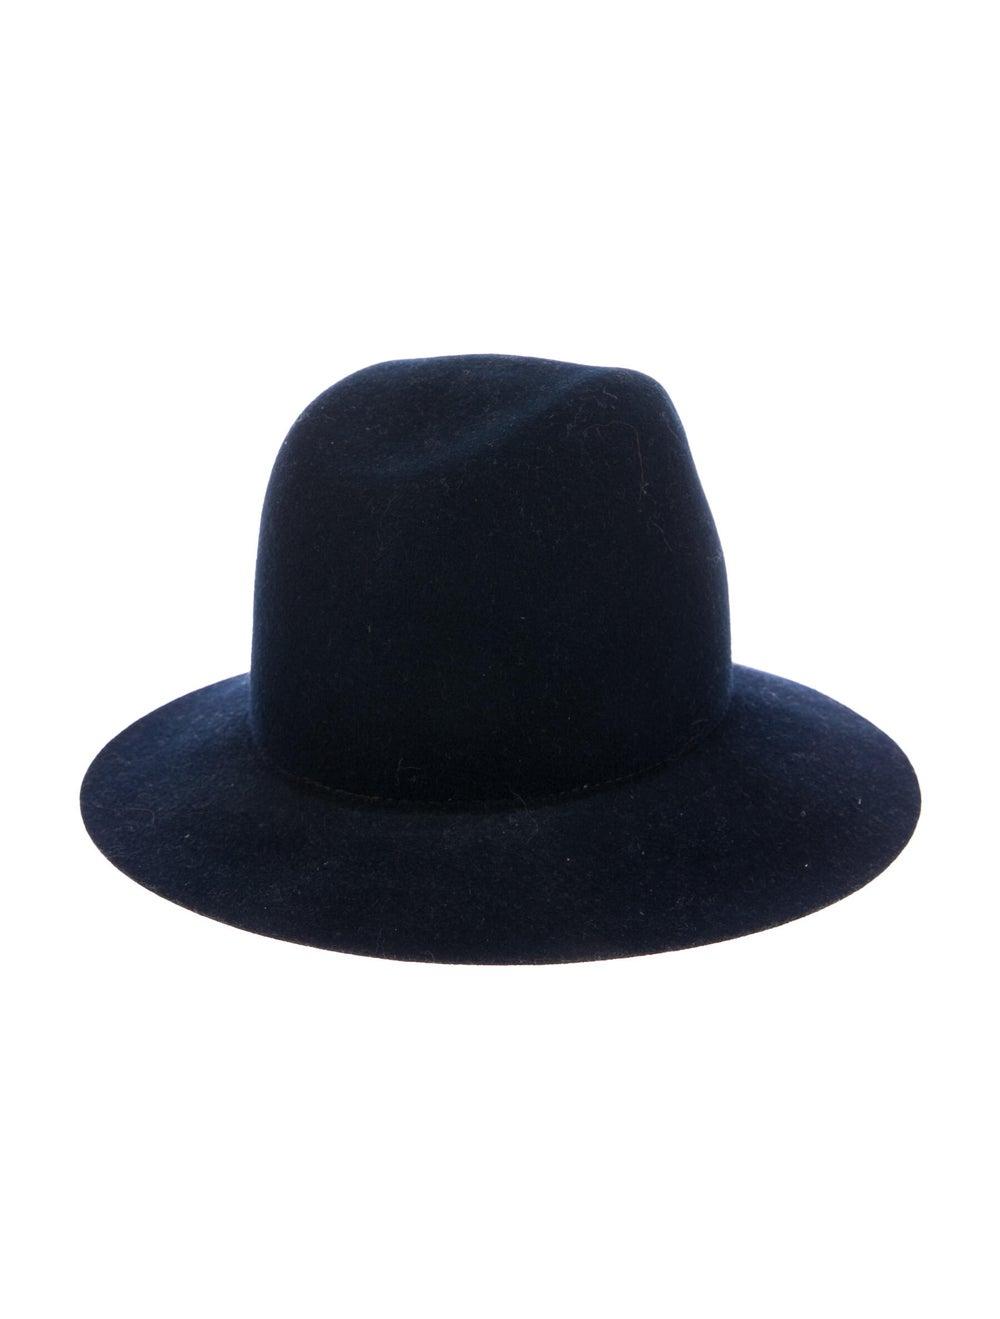 Janessa Leone Felt Fedora Hat Navy - image 2